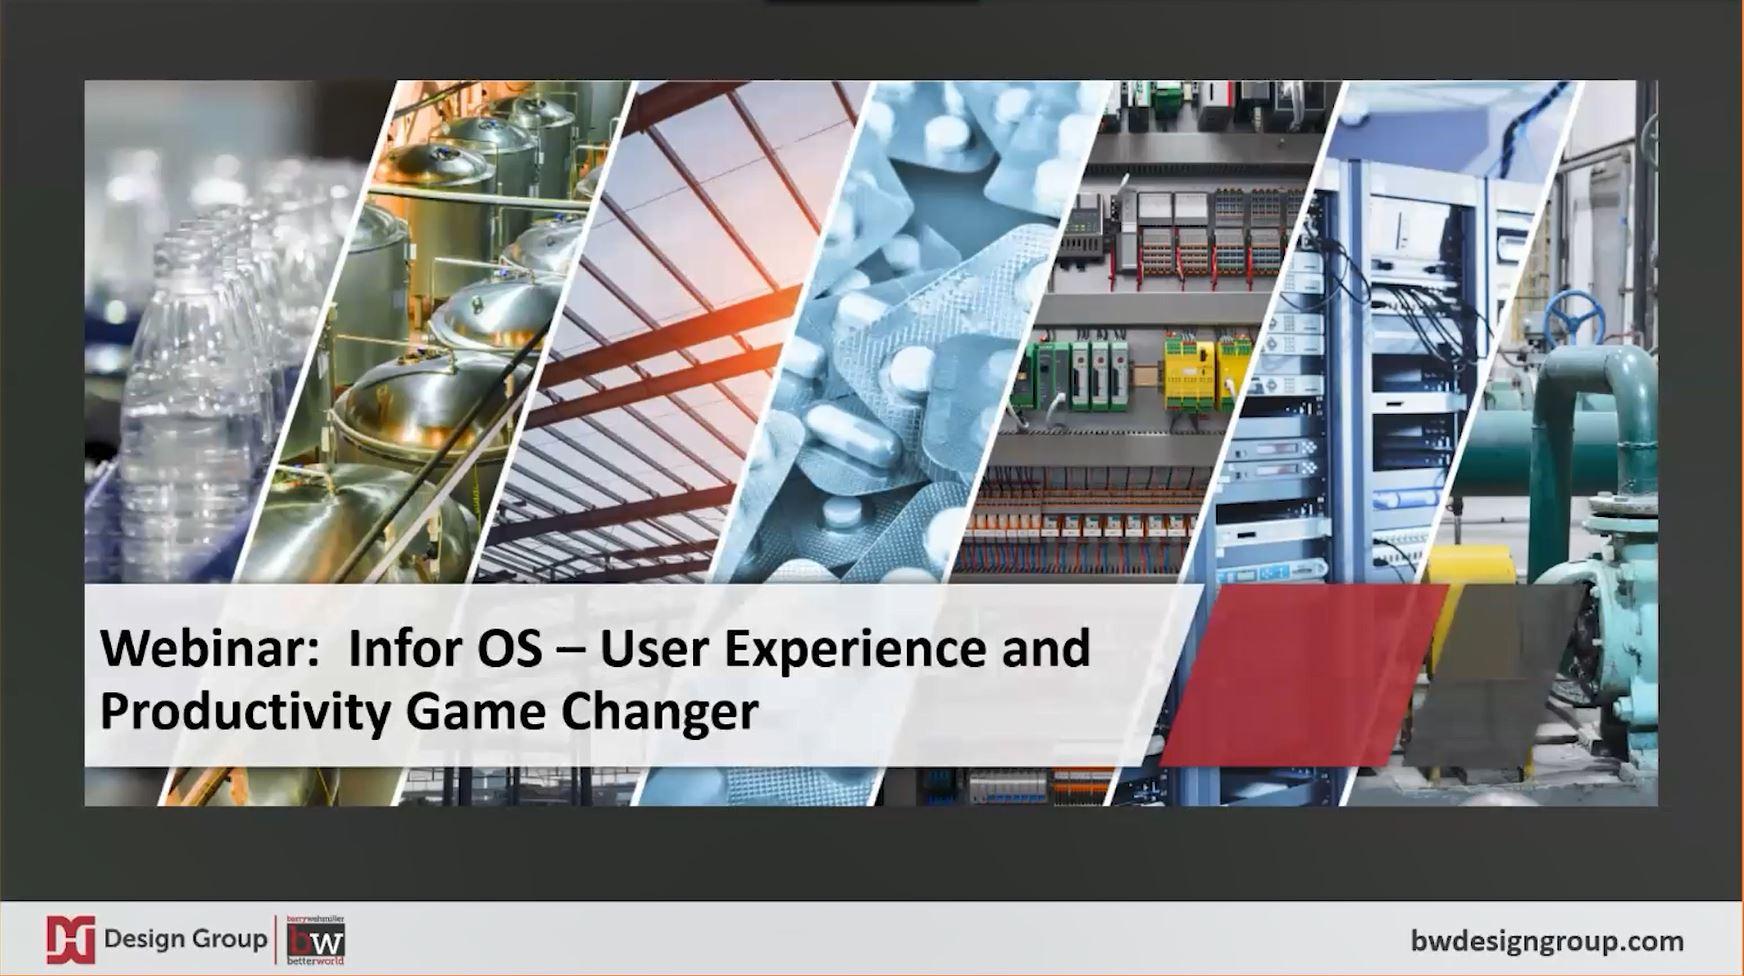 Infor OS - User Experience Webinar